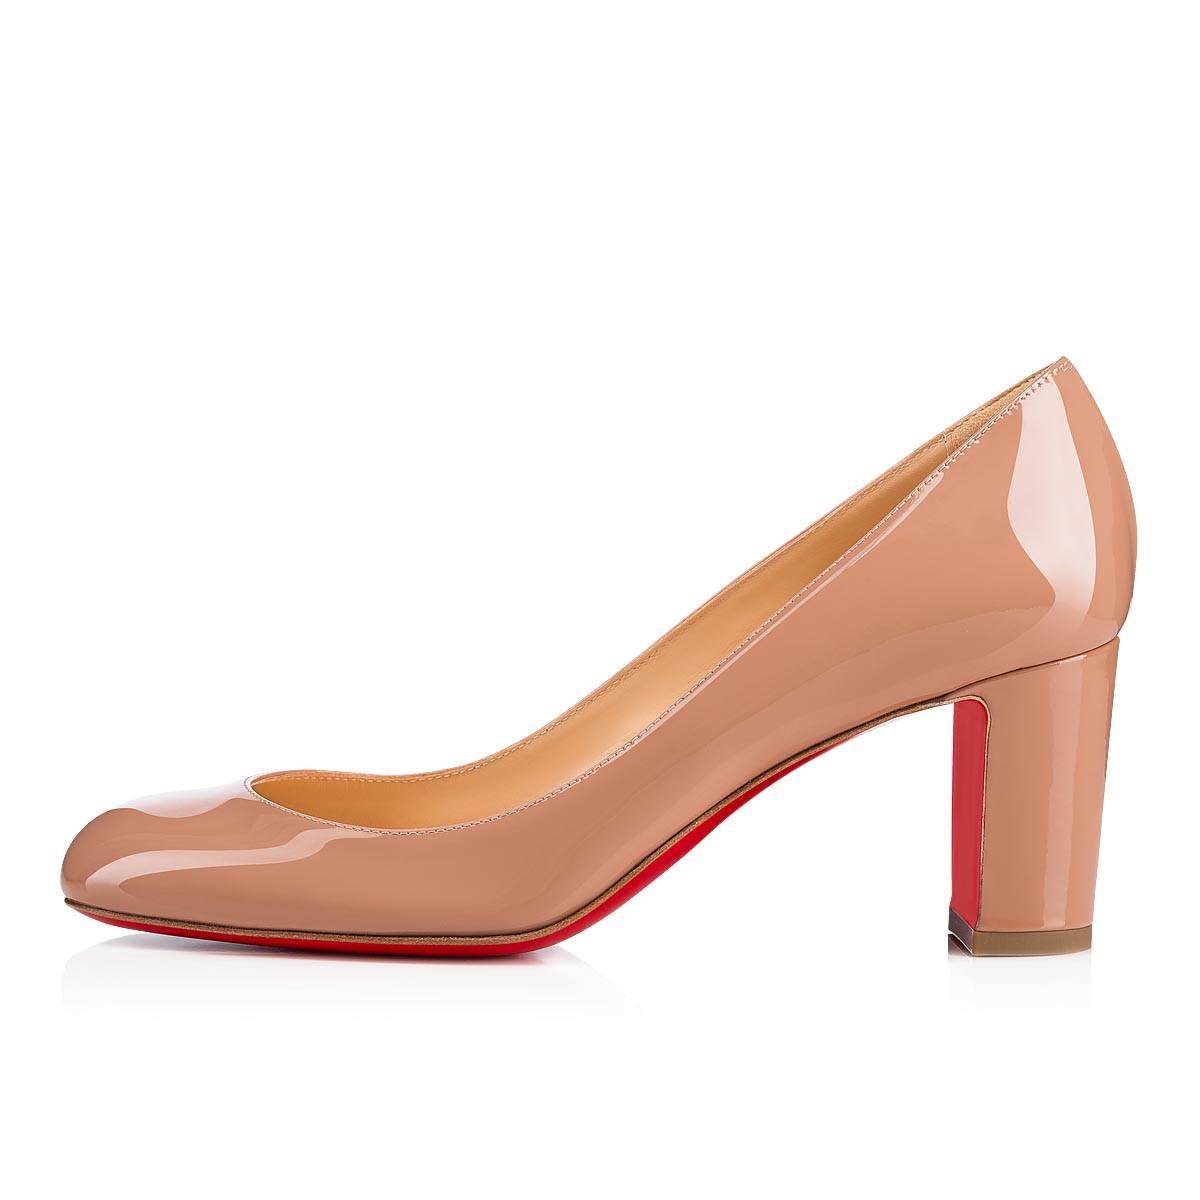 bede936c660e Christian Louboutin Cadrilla Patent Block-Heel Red Sole Pump In Nude ...